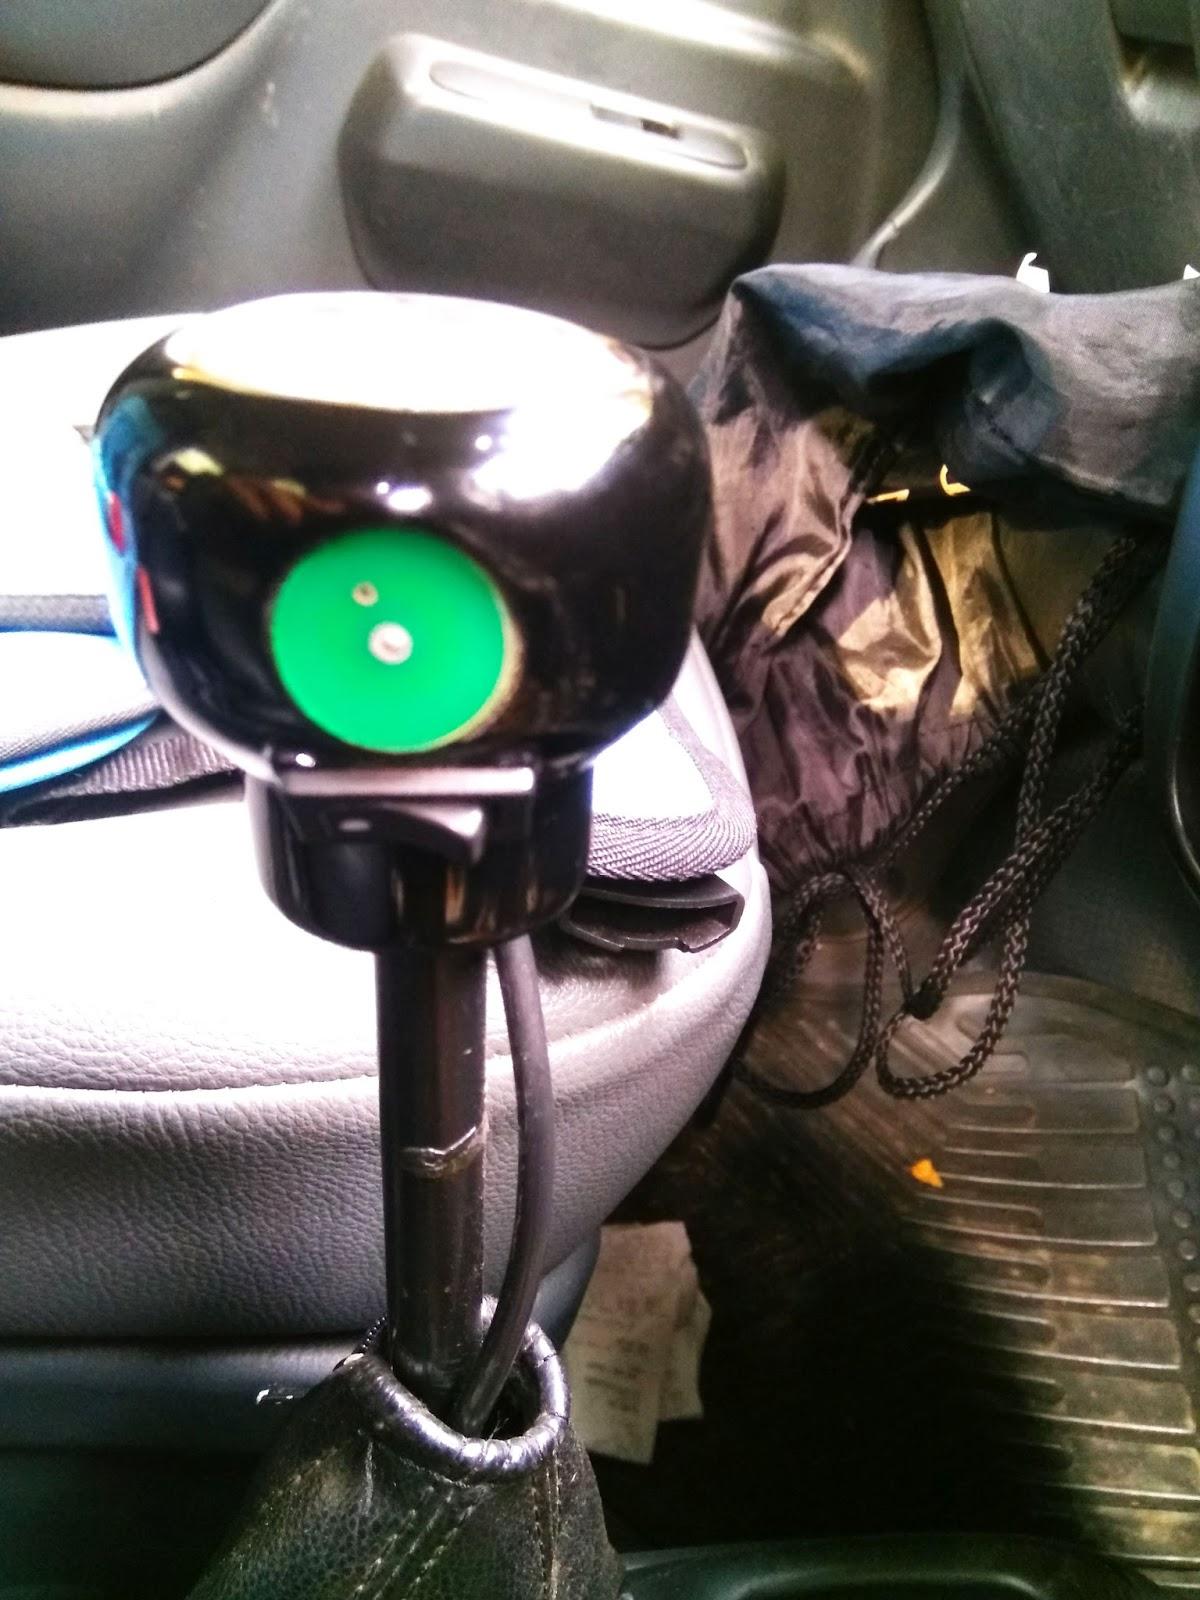 Sudeep's BLOG: Auto Clutch - Dump That Clutch Pedal